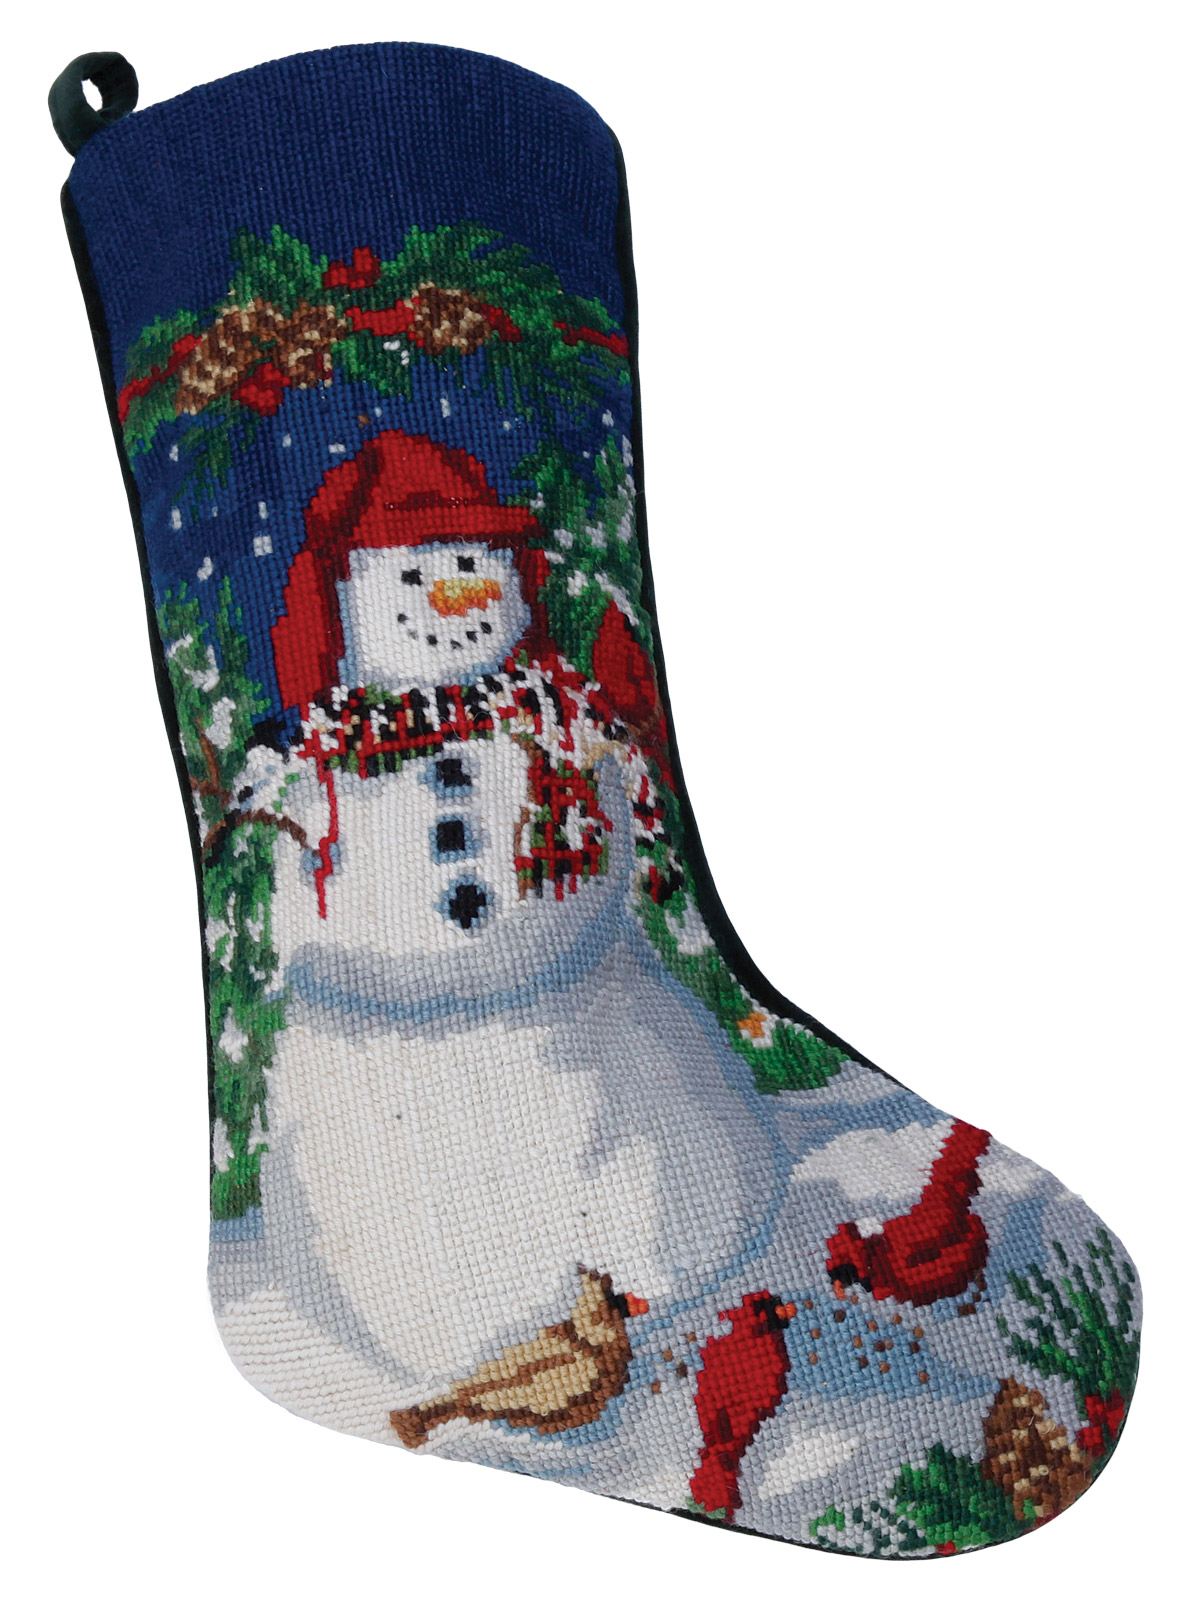 Christmas Stockings Snowman  Accessories  Schweitzer Linen